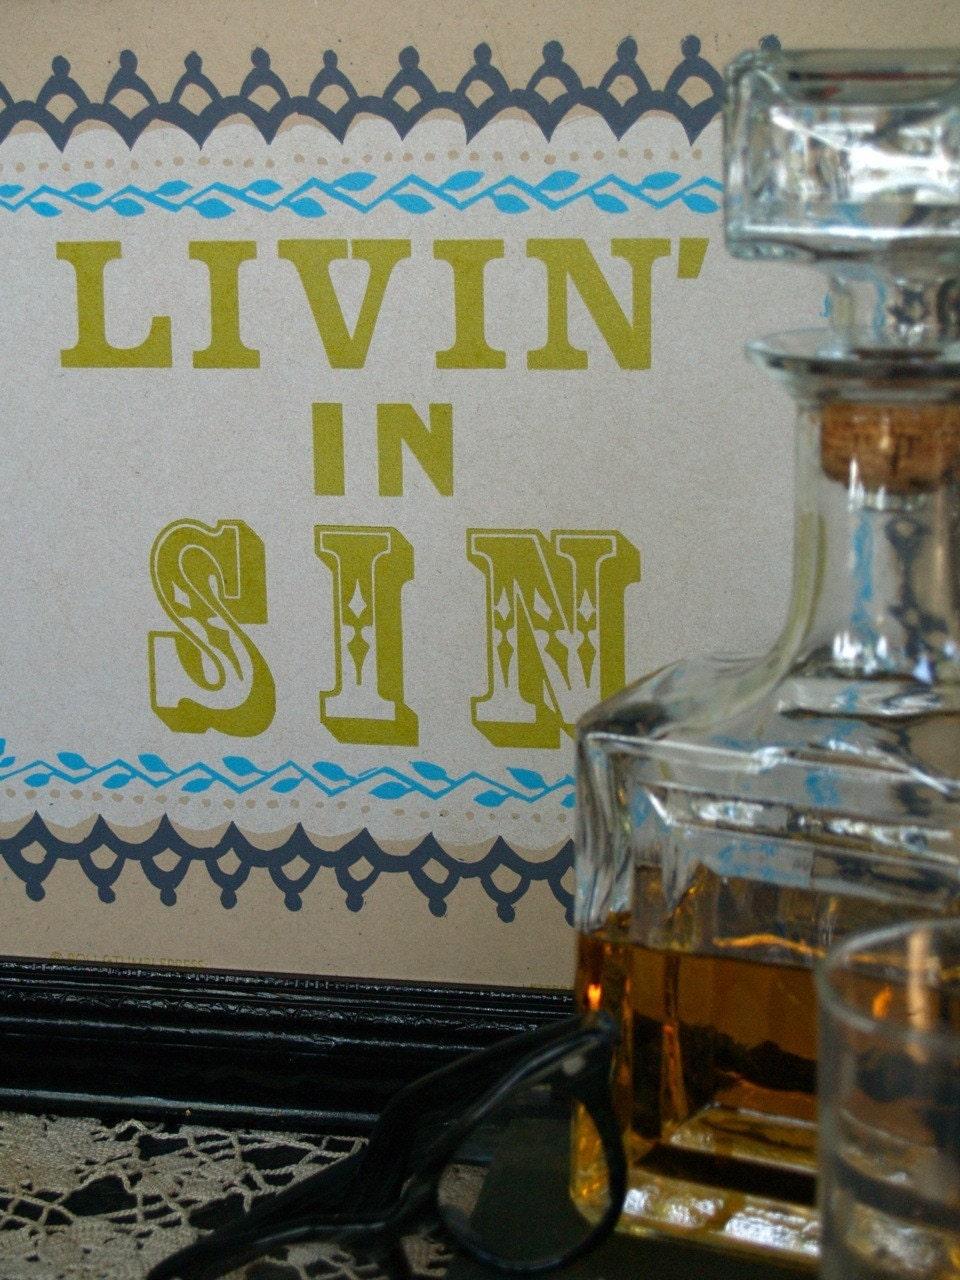 Sinner's Sampler Hand Printed Letterpress by rollandtumblepress from etsy.com